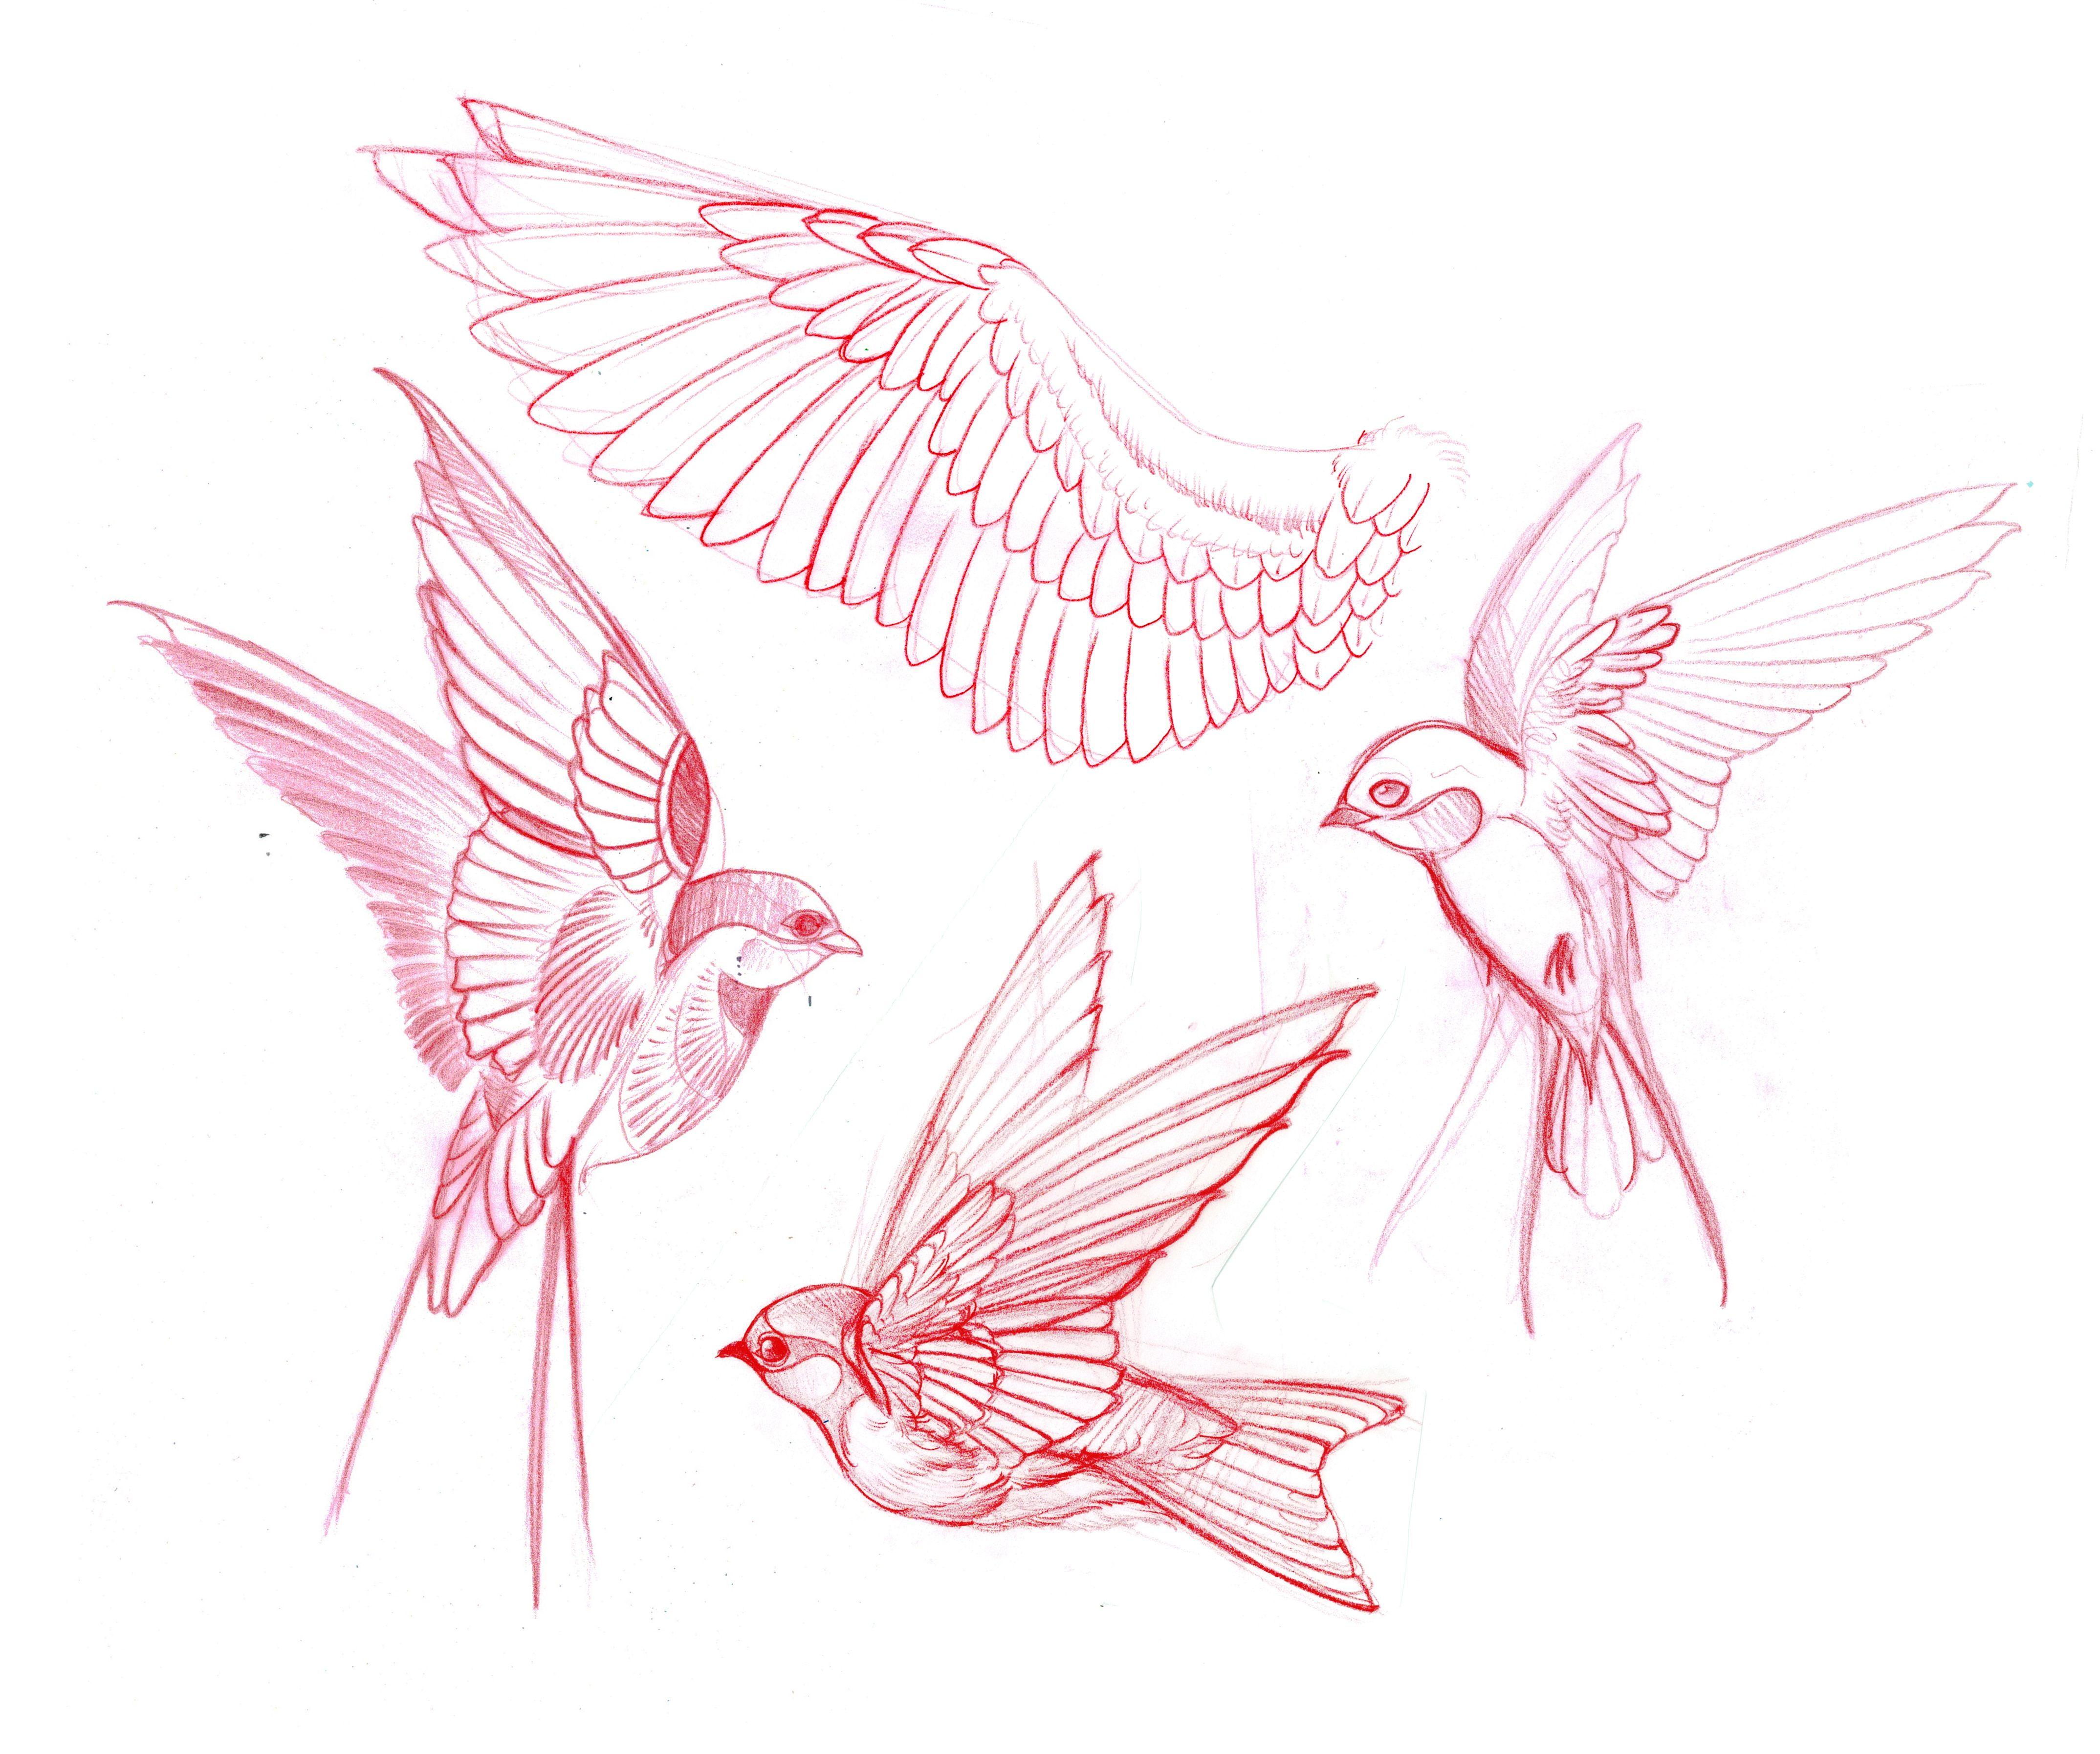 Bird Tattoo Sketch Design Sketch Tattoo Design Birds Tattoo Tattoo Sketches